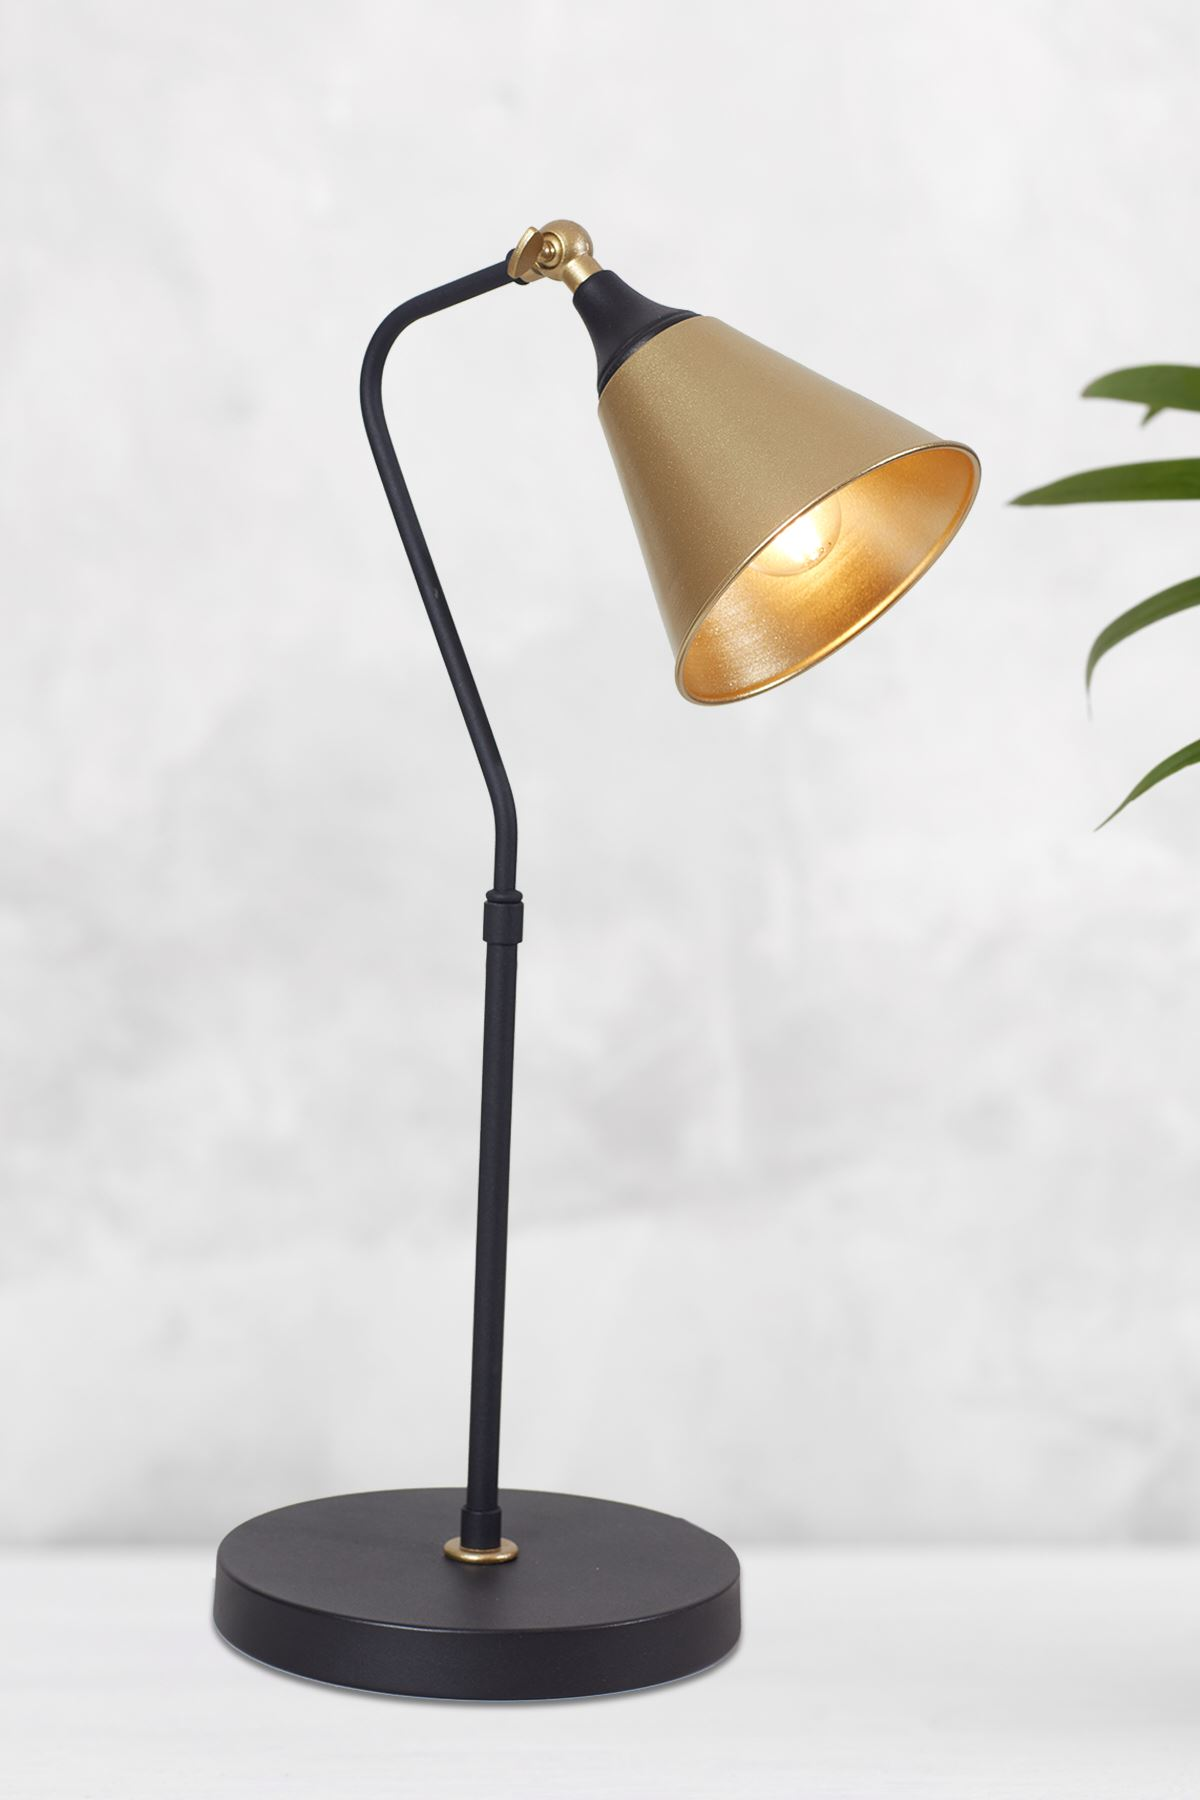 Kapo Sarı -Siyah Metal Gövde Tasarım Lüx Masa Lambası